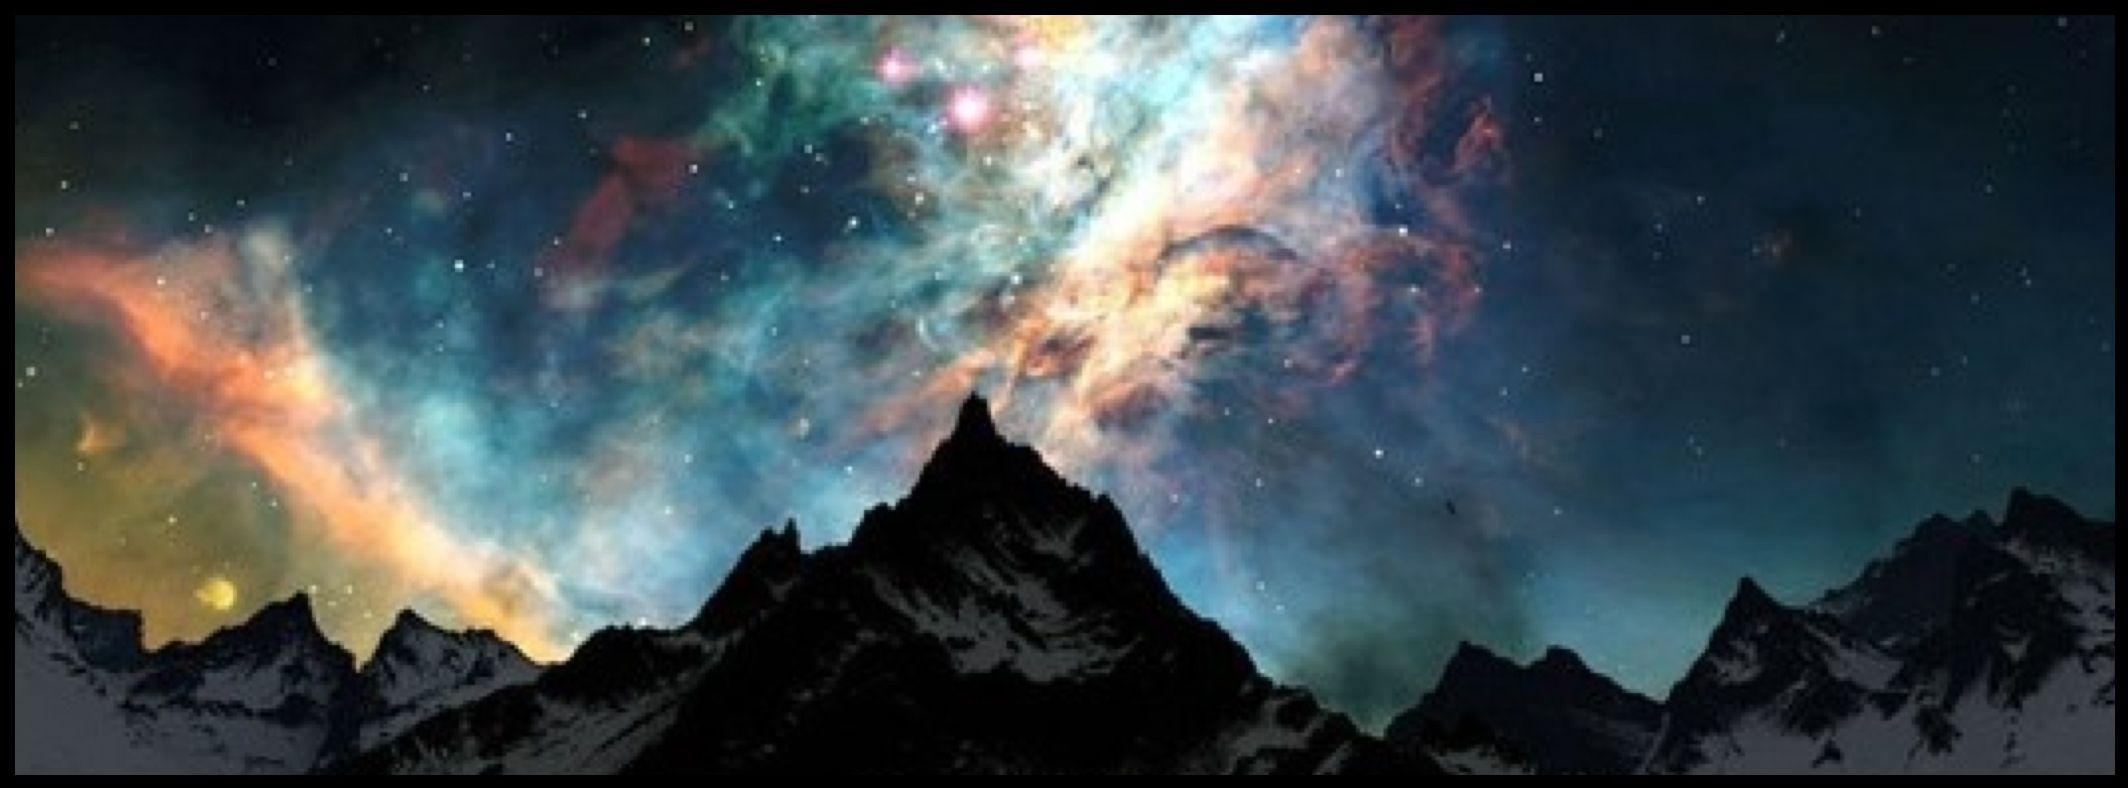 Alaska Sky, Northern Lights, Facebook cover photo Nature